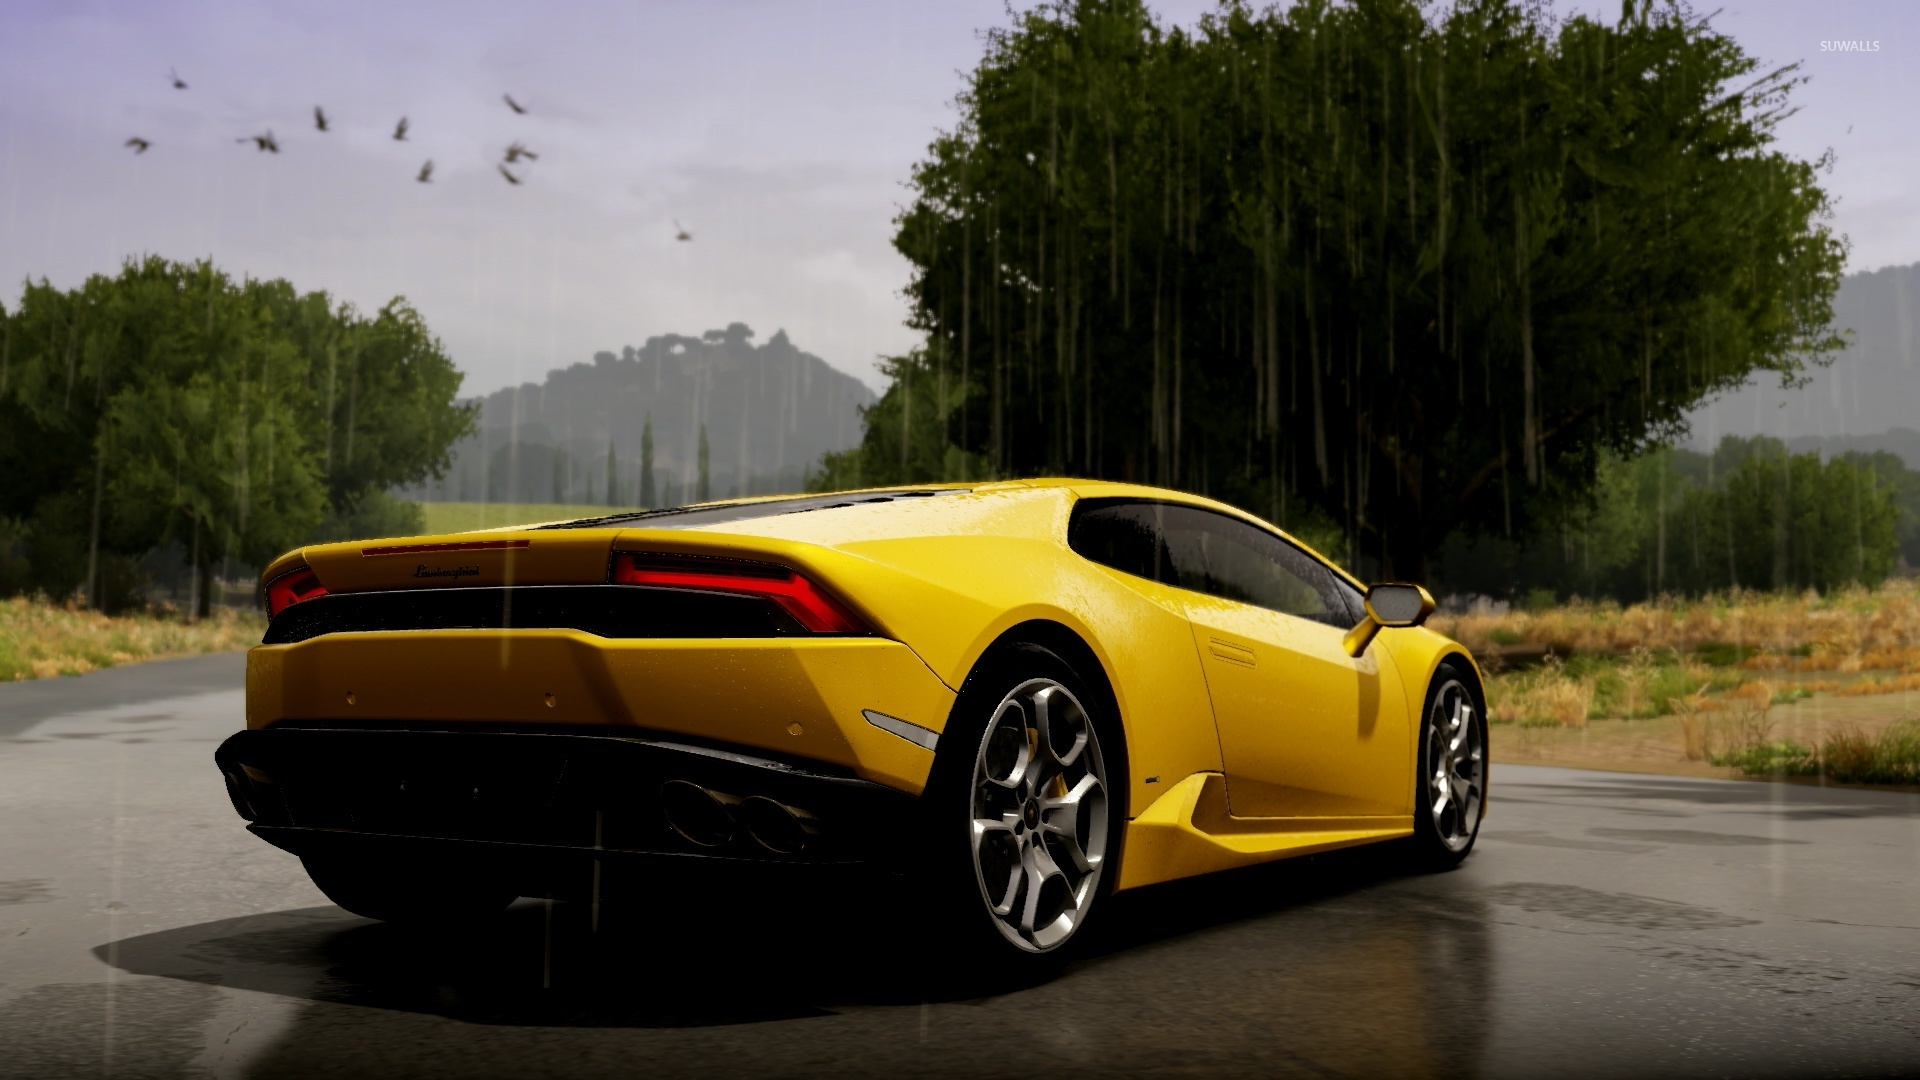 lamborghini-huracan-lp-610-4-forza-horizon-2-31251-1920x1080 Extraordinary Lamborghini Huracan Need for Speed Cars Trend